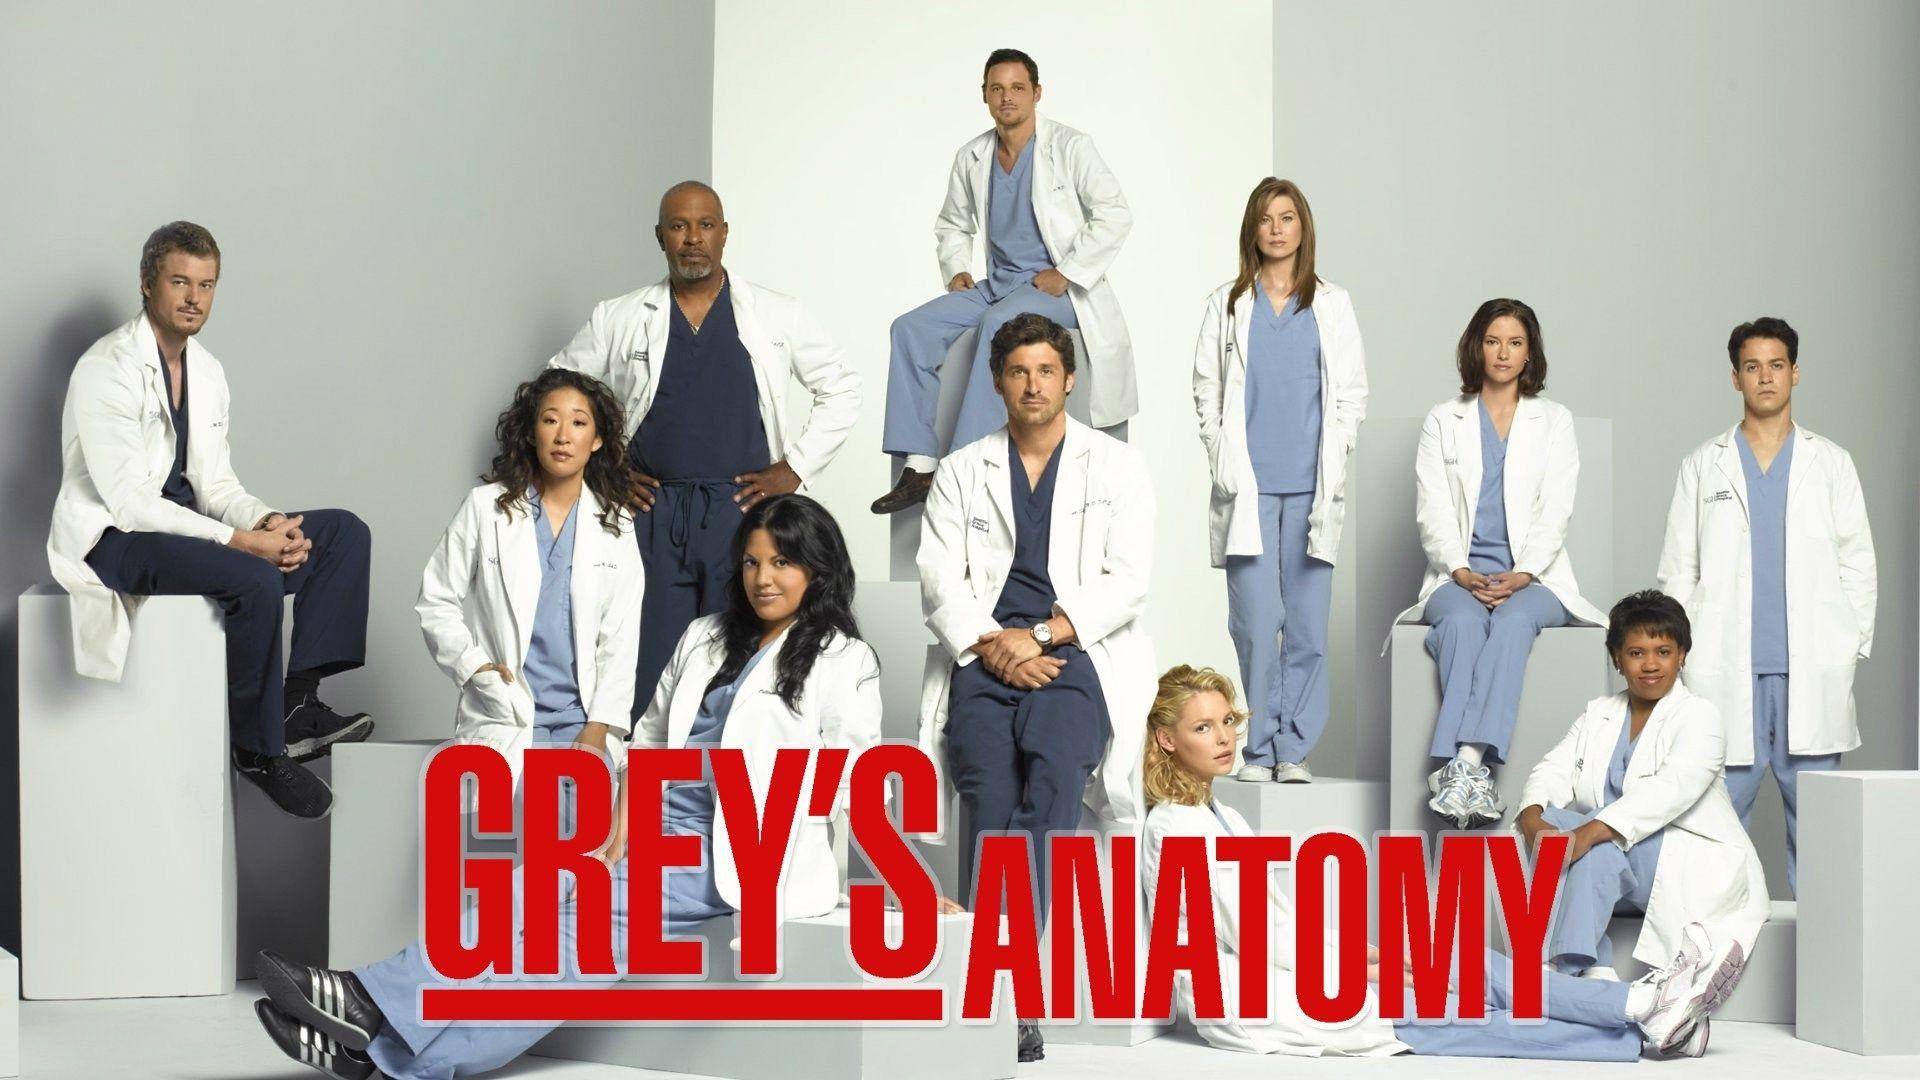 Free Screensaver Greys Anatomy Pic Greys Anatomy Category Greys